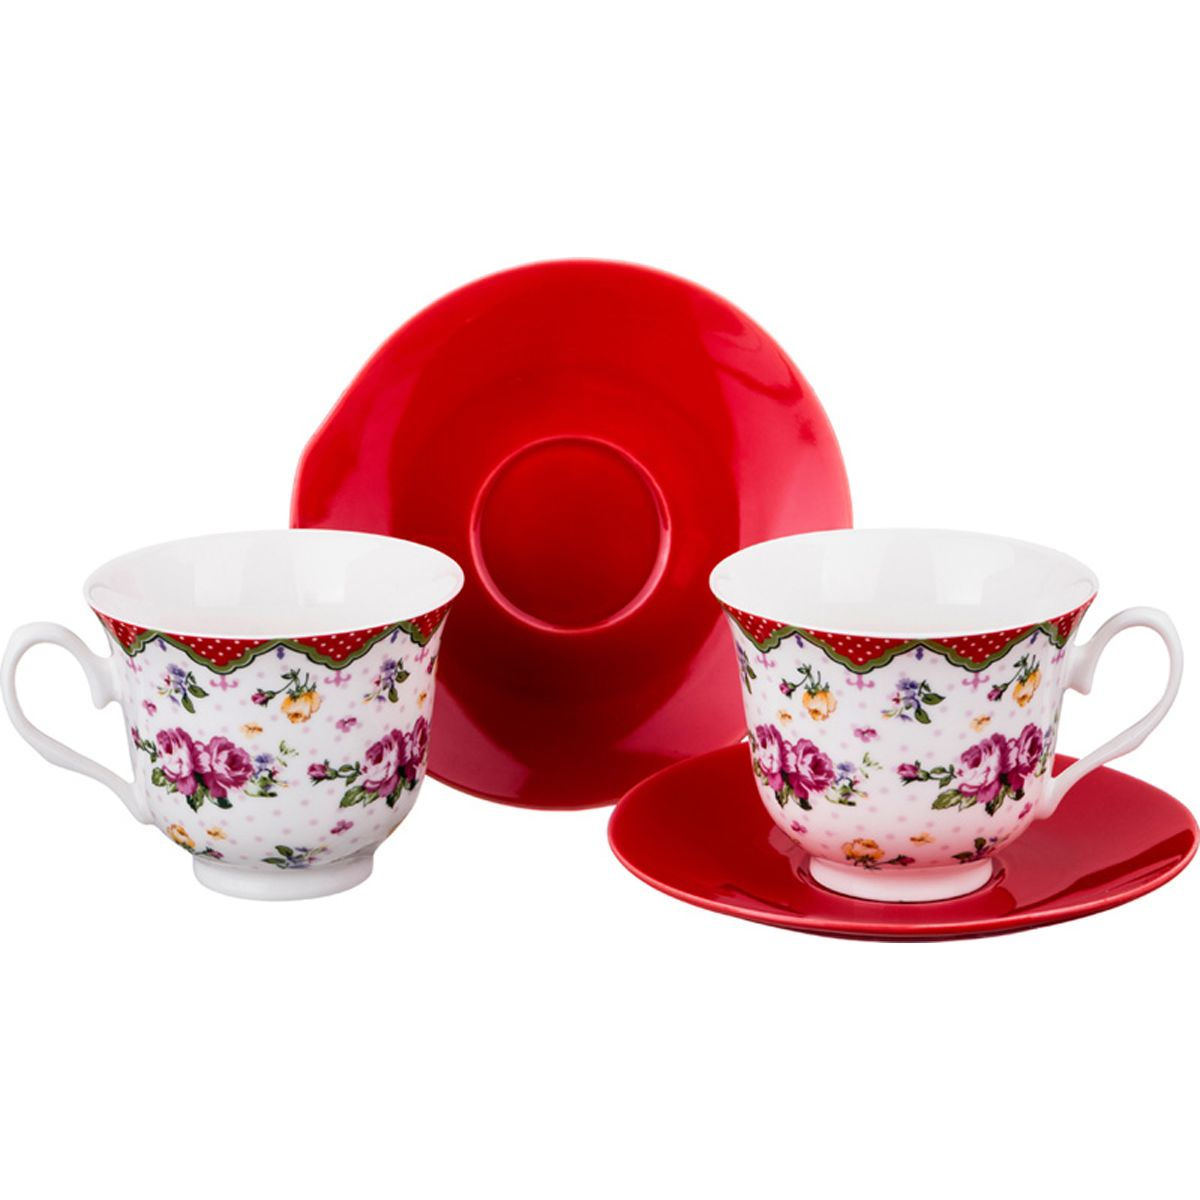 Чайный набор на 2 персоны Lefard Яркий сад, белый, красный, 220 мл набор чайный 220 мл bohemia набор чайный 220 мл